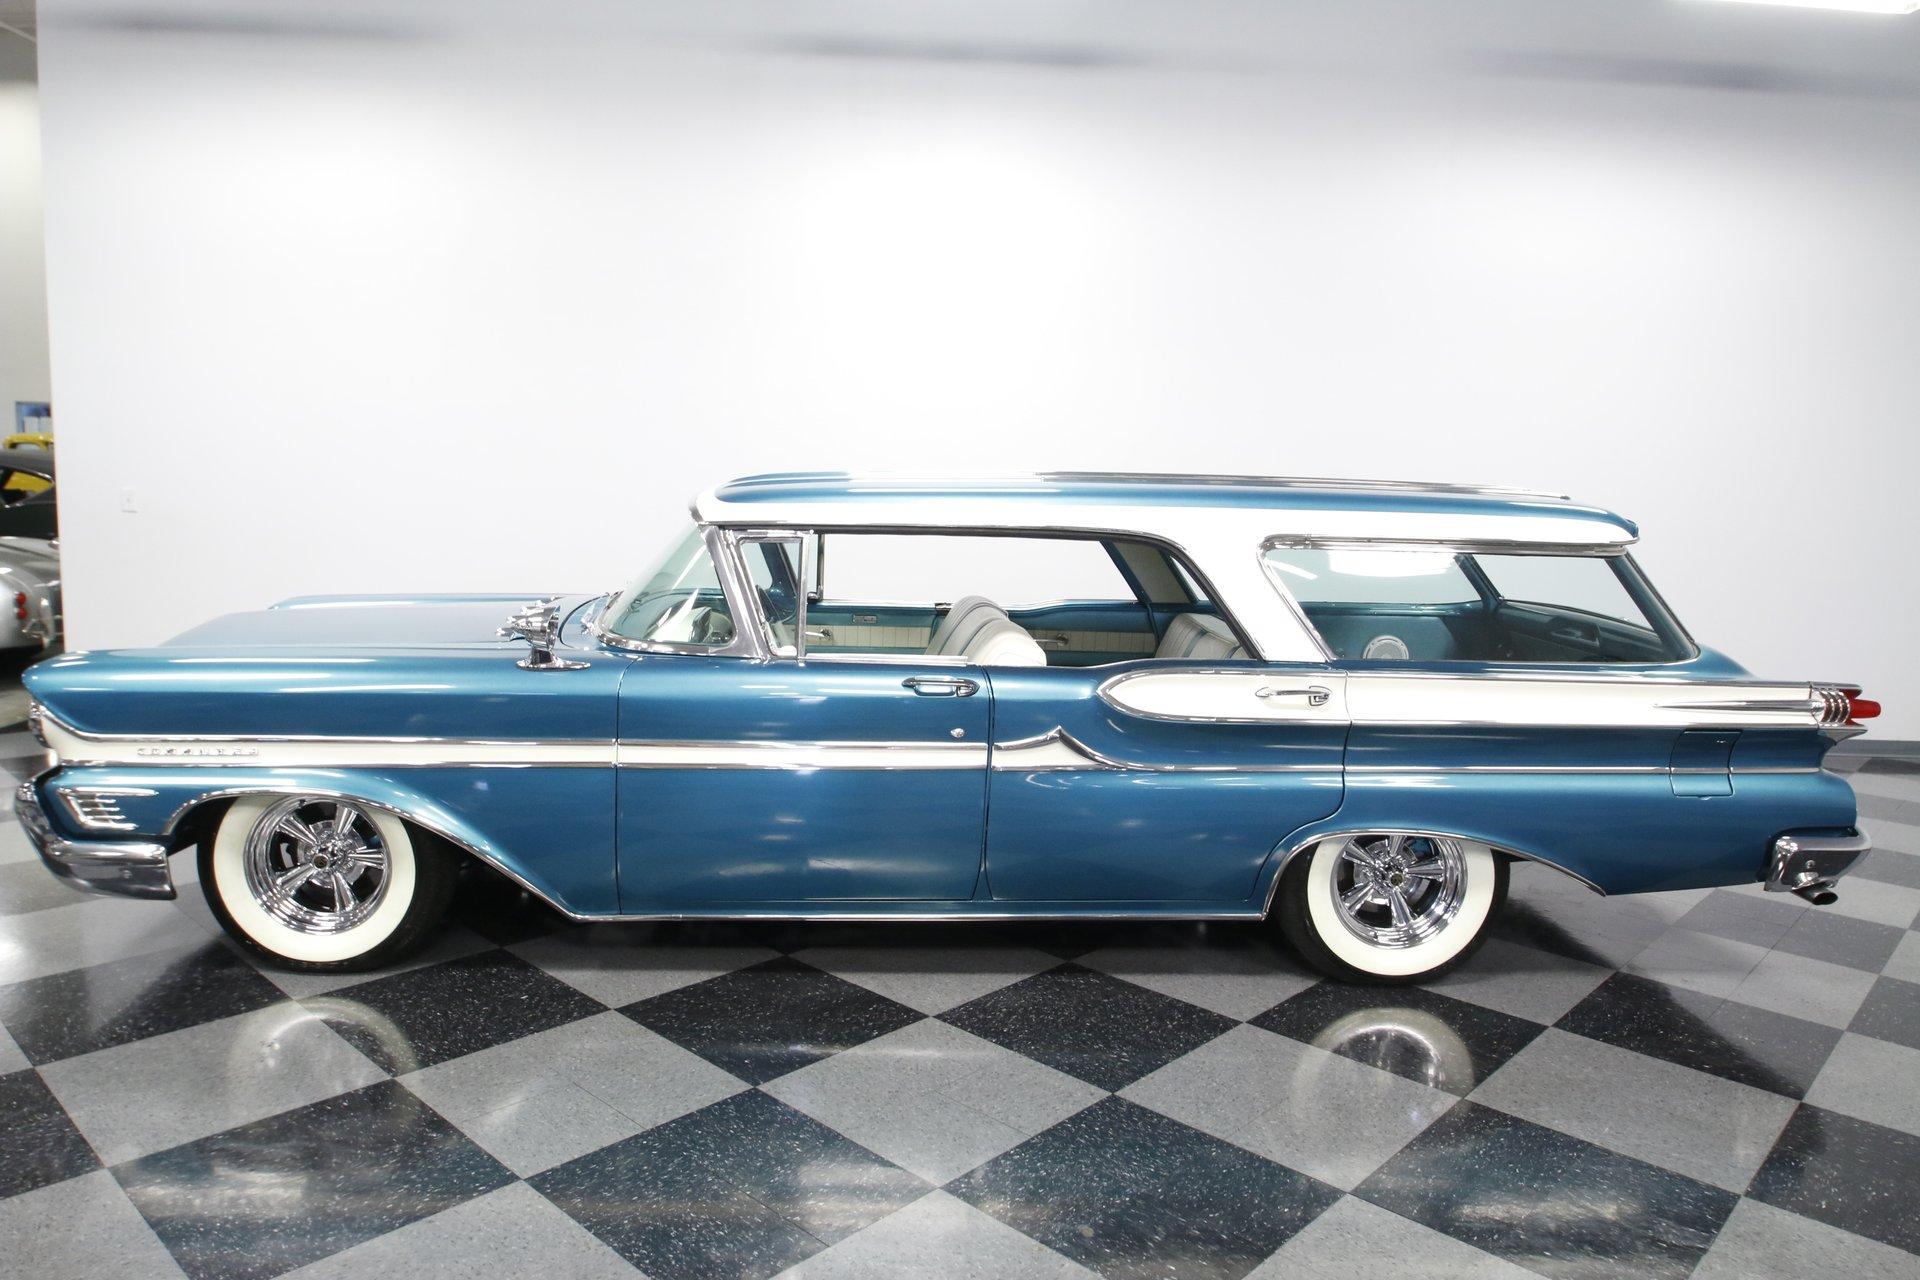 1958 mercury commuter 6 passenger hardtop wagon